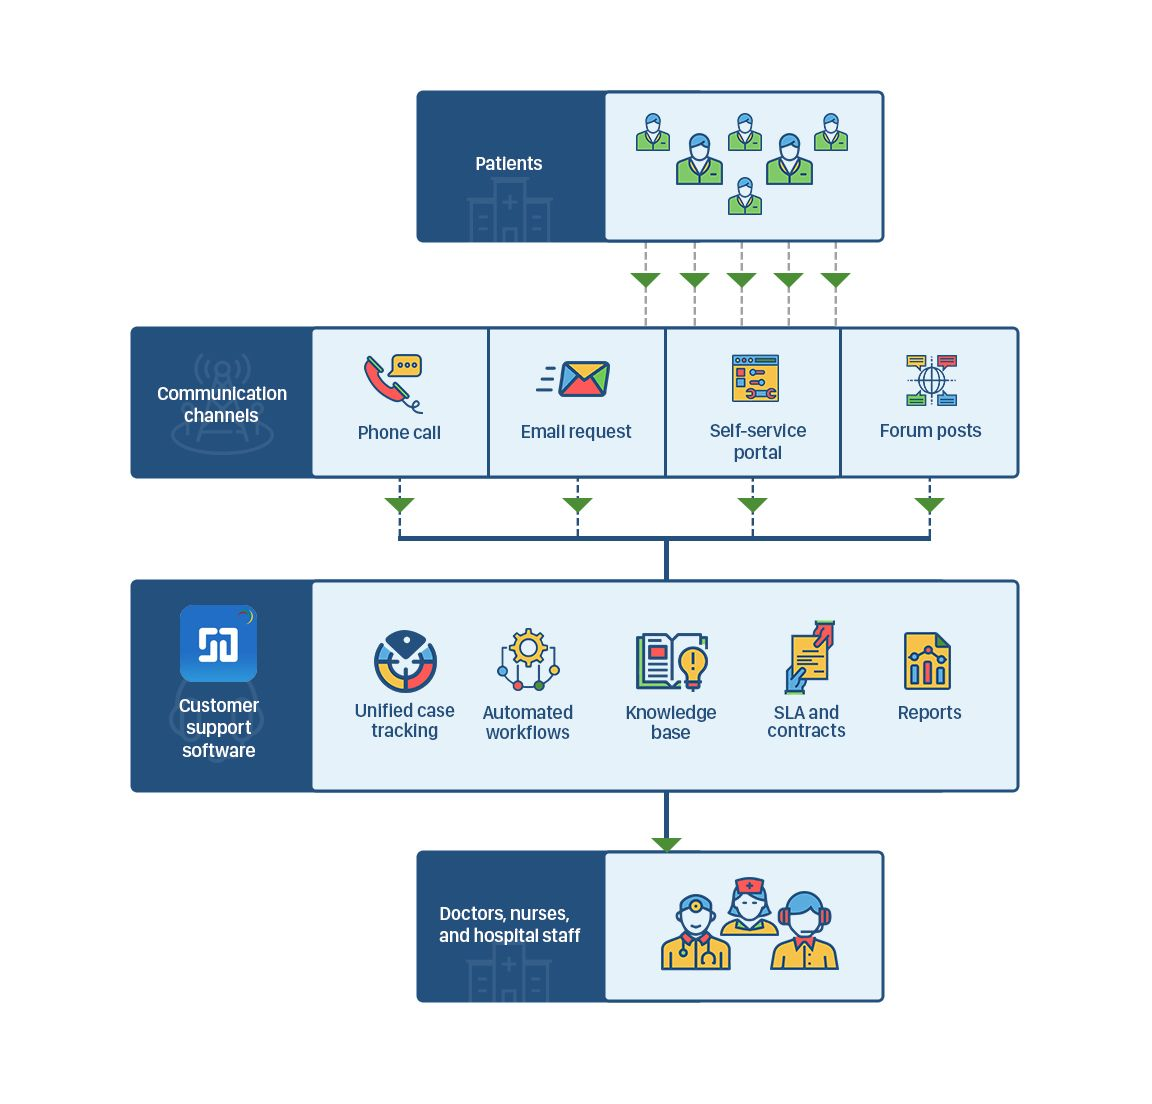 It Helpdesk Software For Healthcare Medical Industry Workflow Process Help Desk Change Management Future Trends